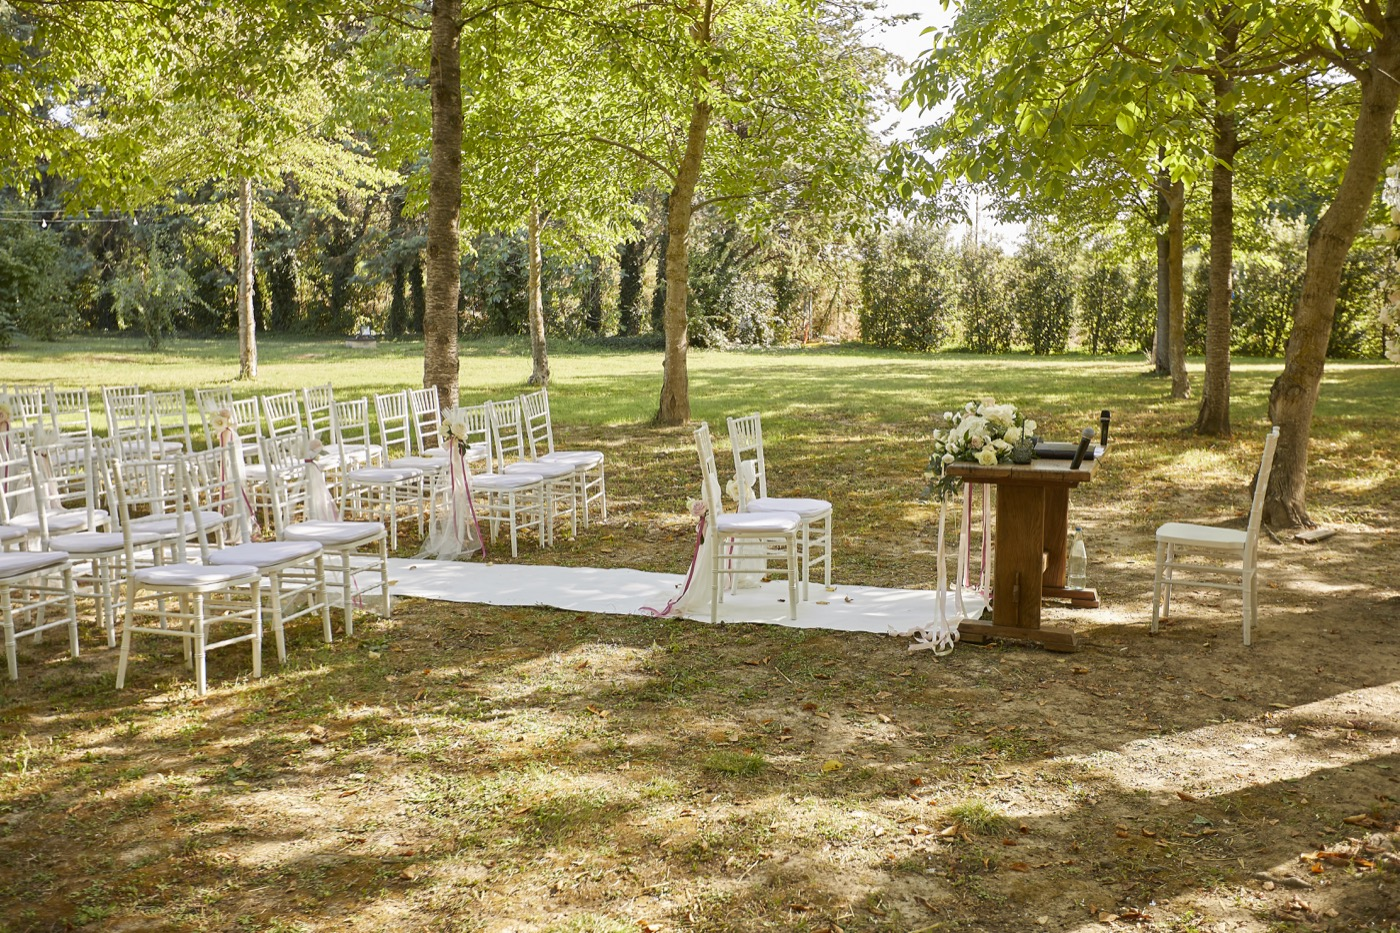 Claudio-Coppola-wedding-photographer-la-scuderia-eventi-preparativi-la-rosetta-perugia-37